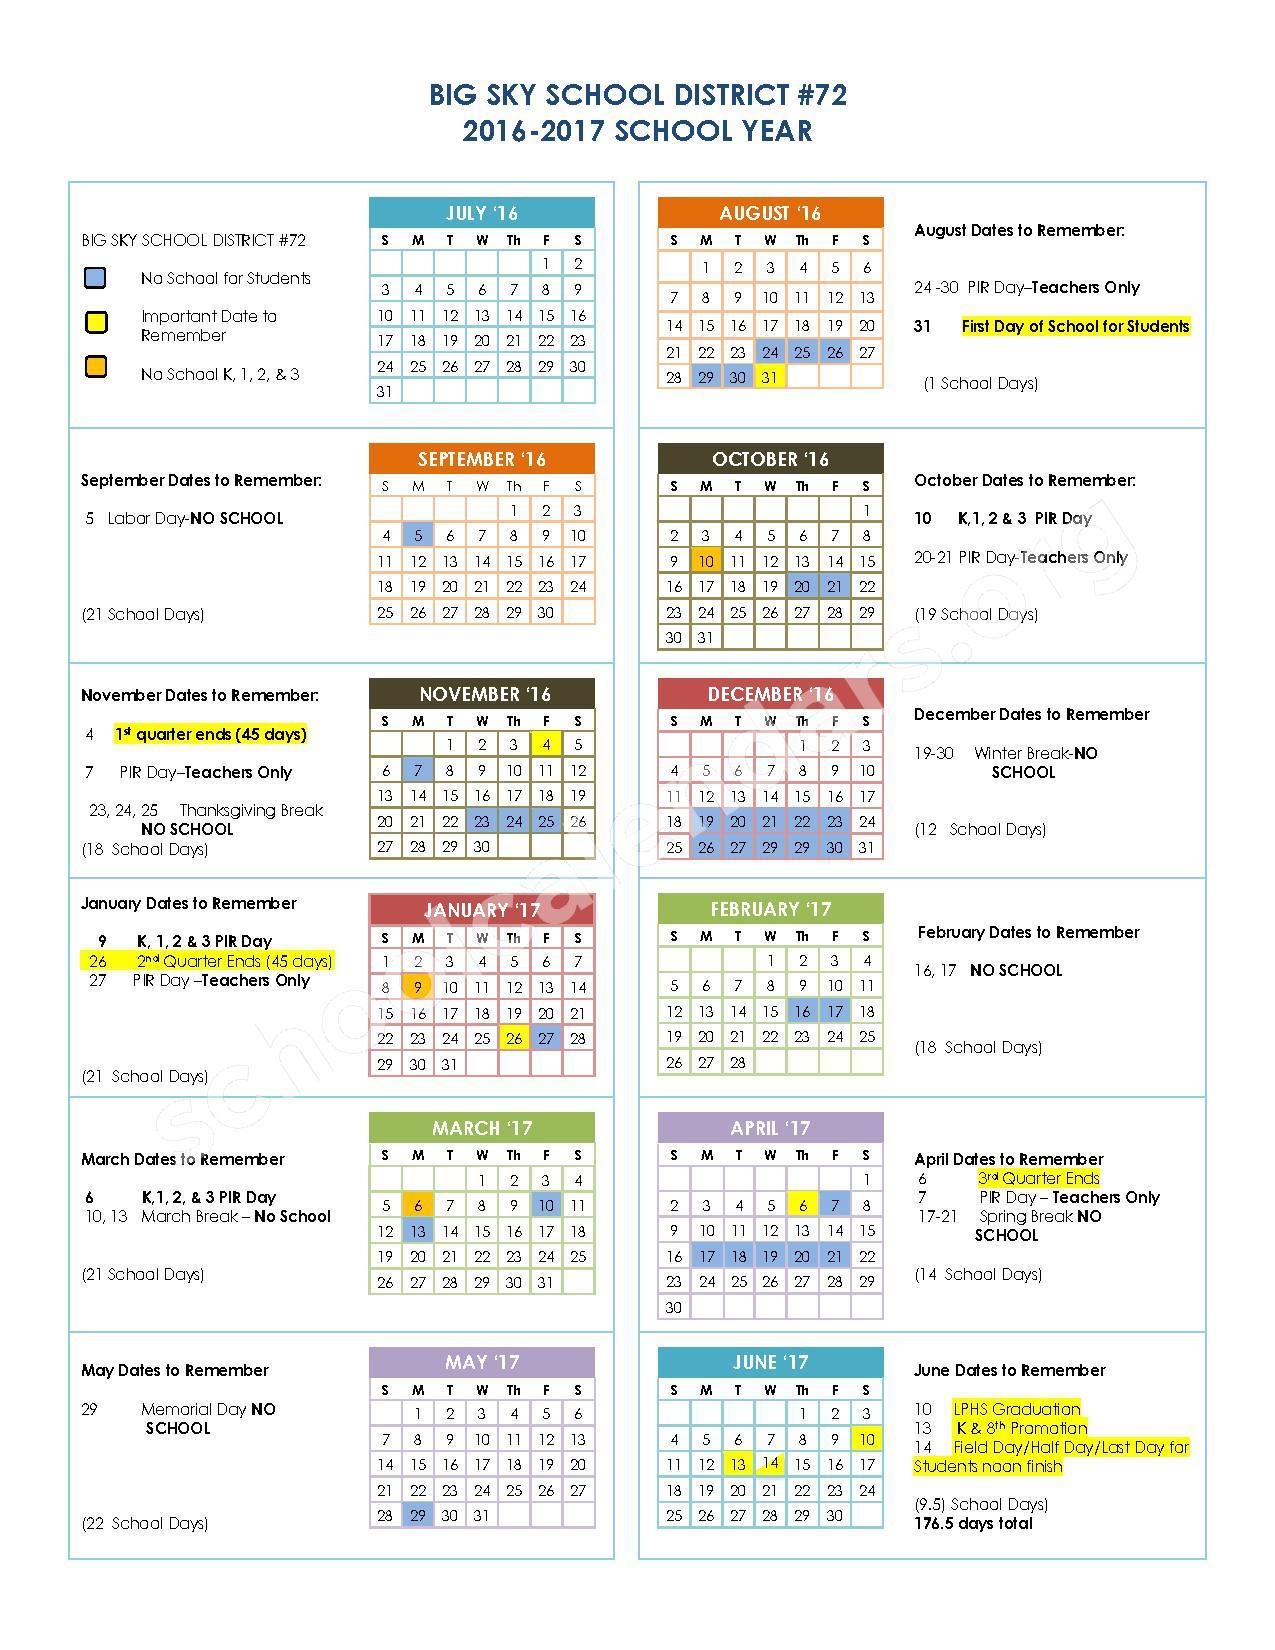 2016 - 2017 Academic Calendar – Big Sky School District 72 – page 1